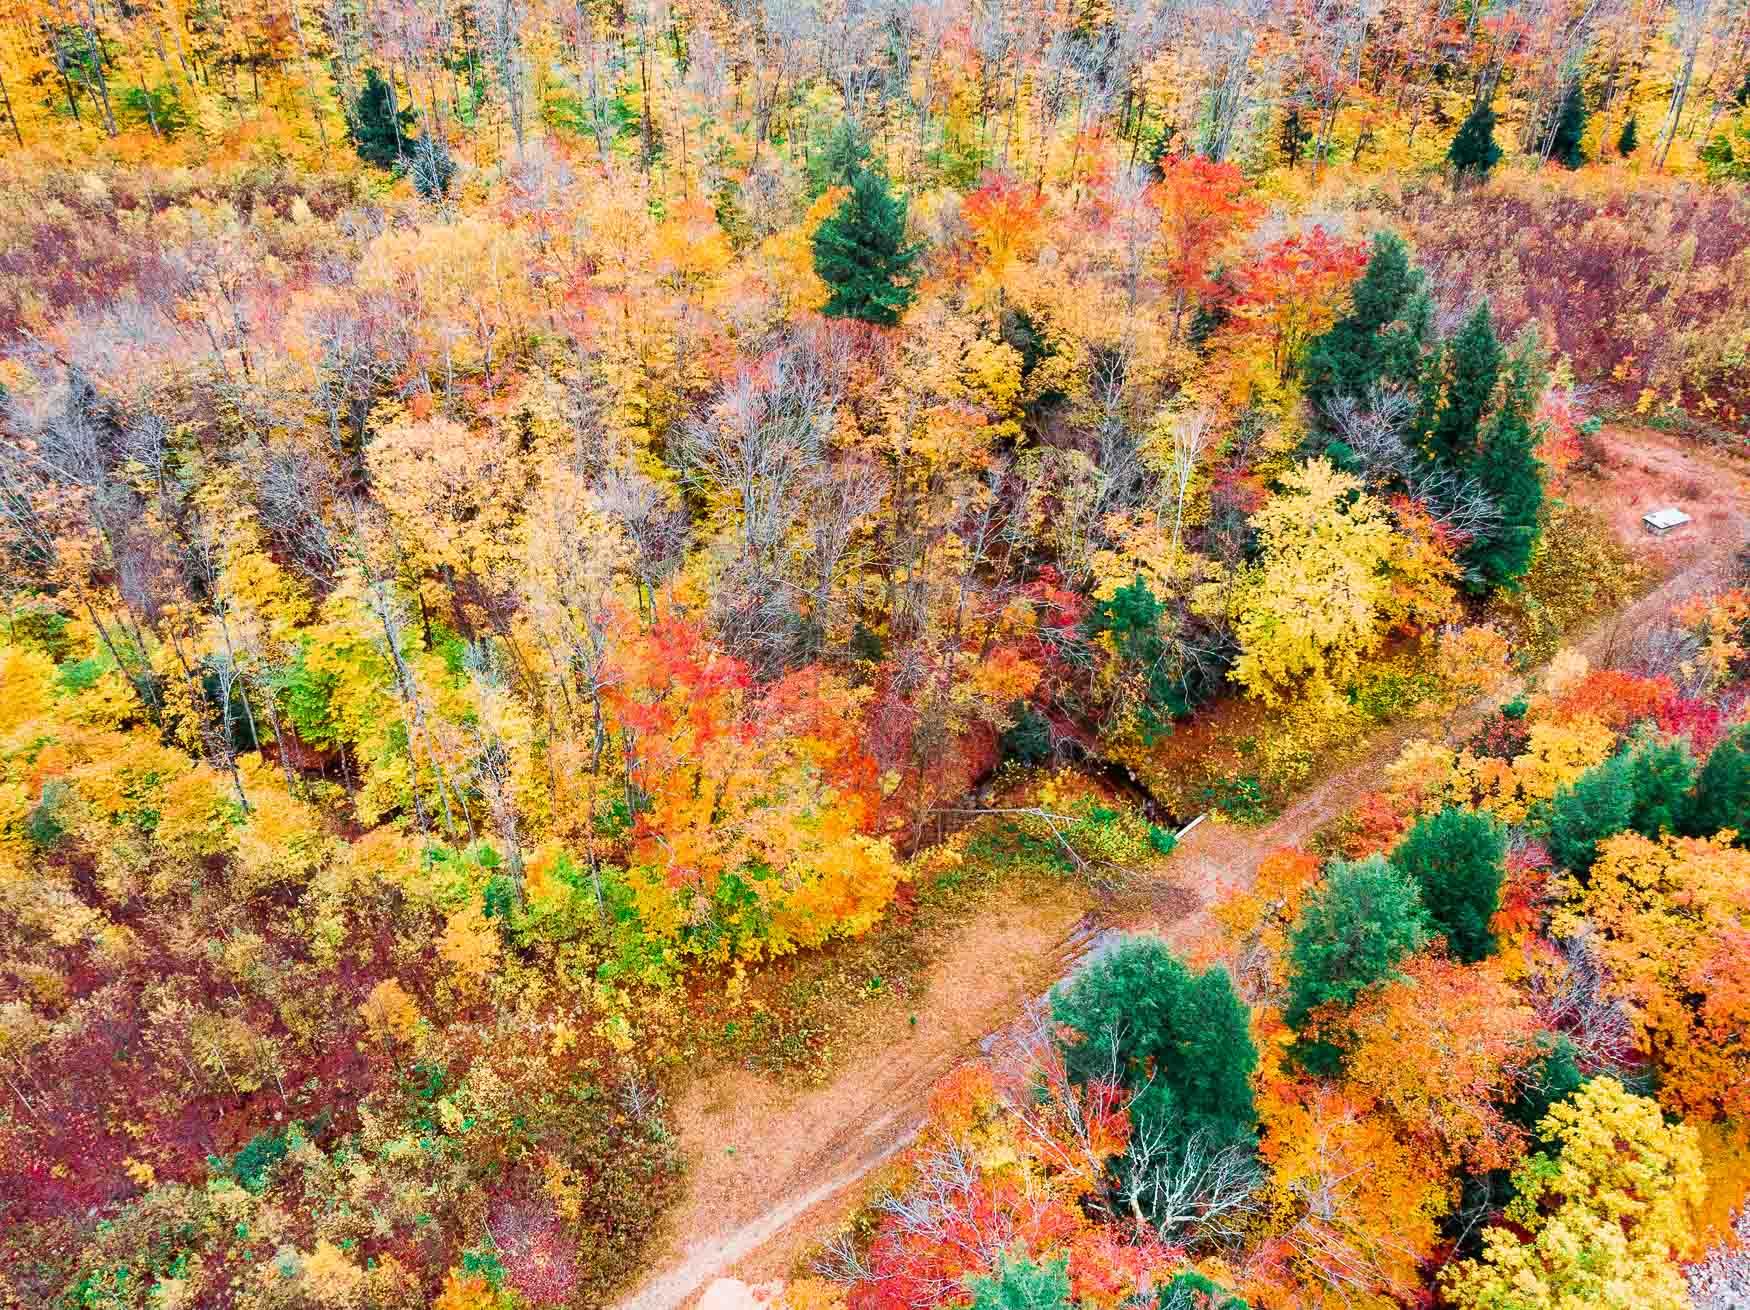 20181025-New Hampshire Day Three (Drone)-0003.jpg